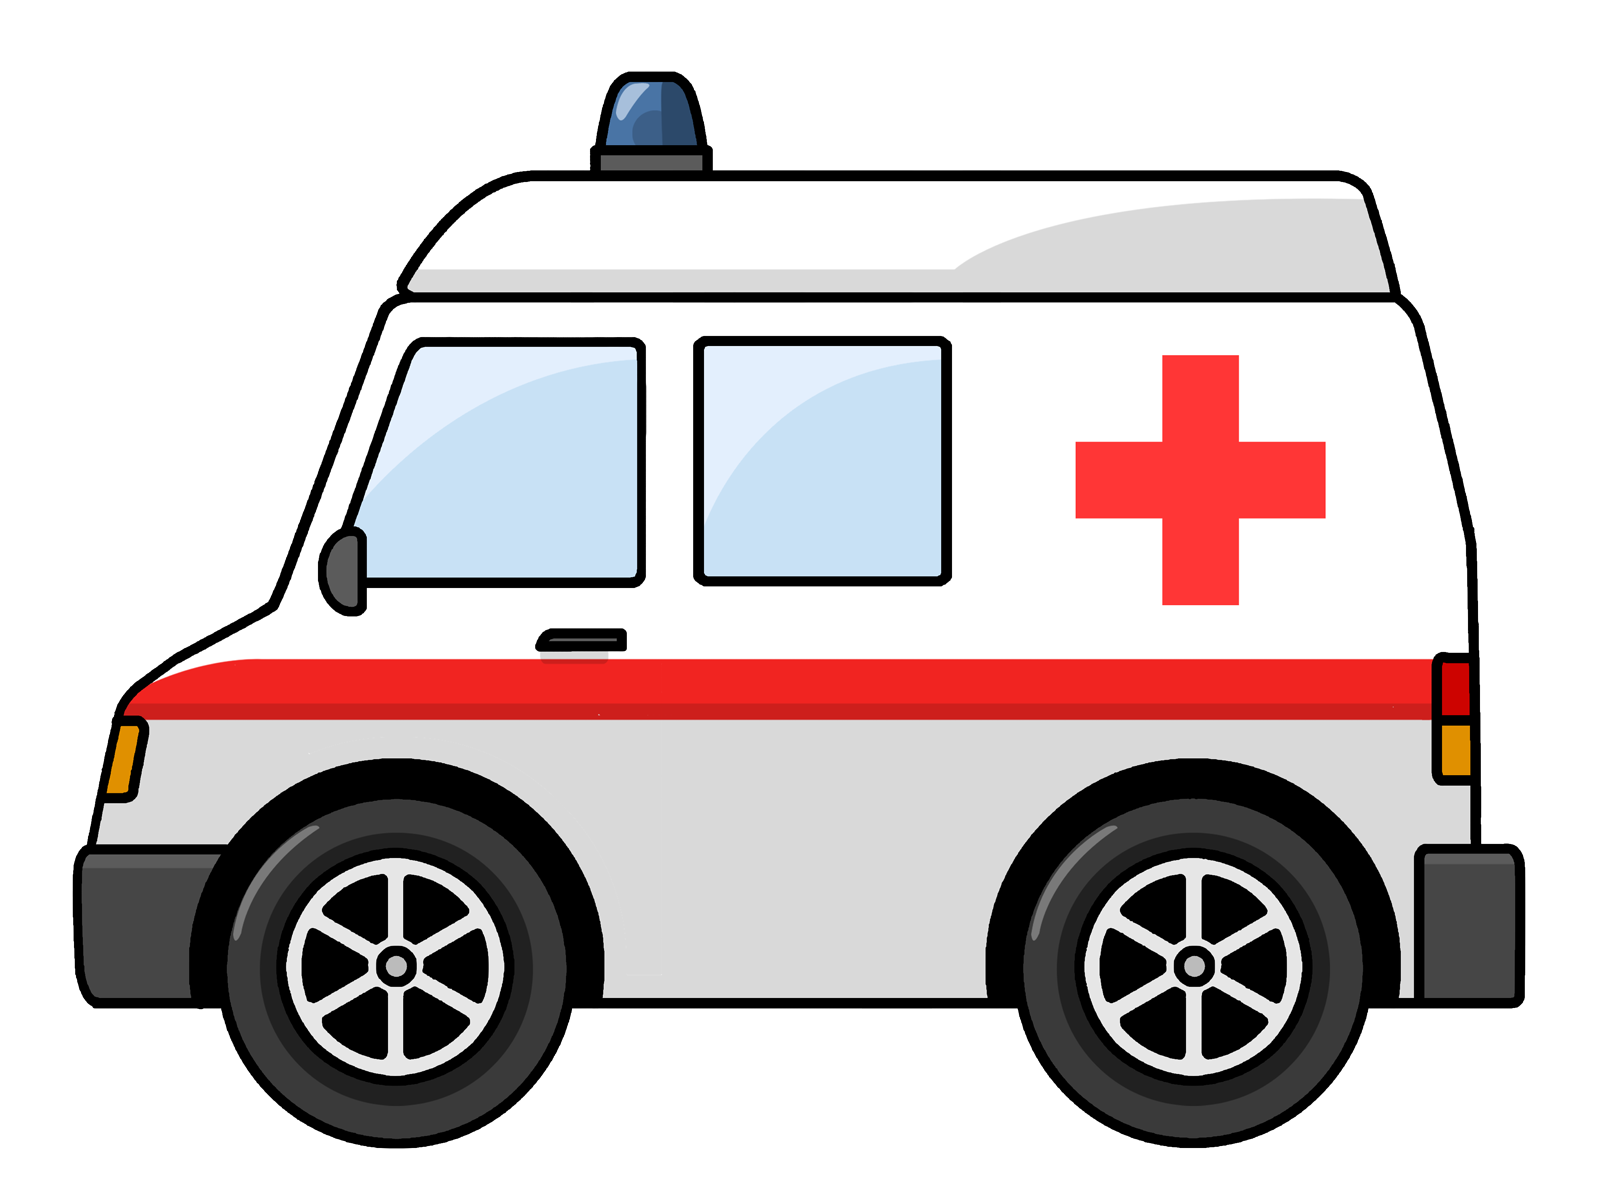 Desun Hospital Ambulance